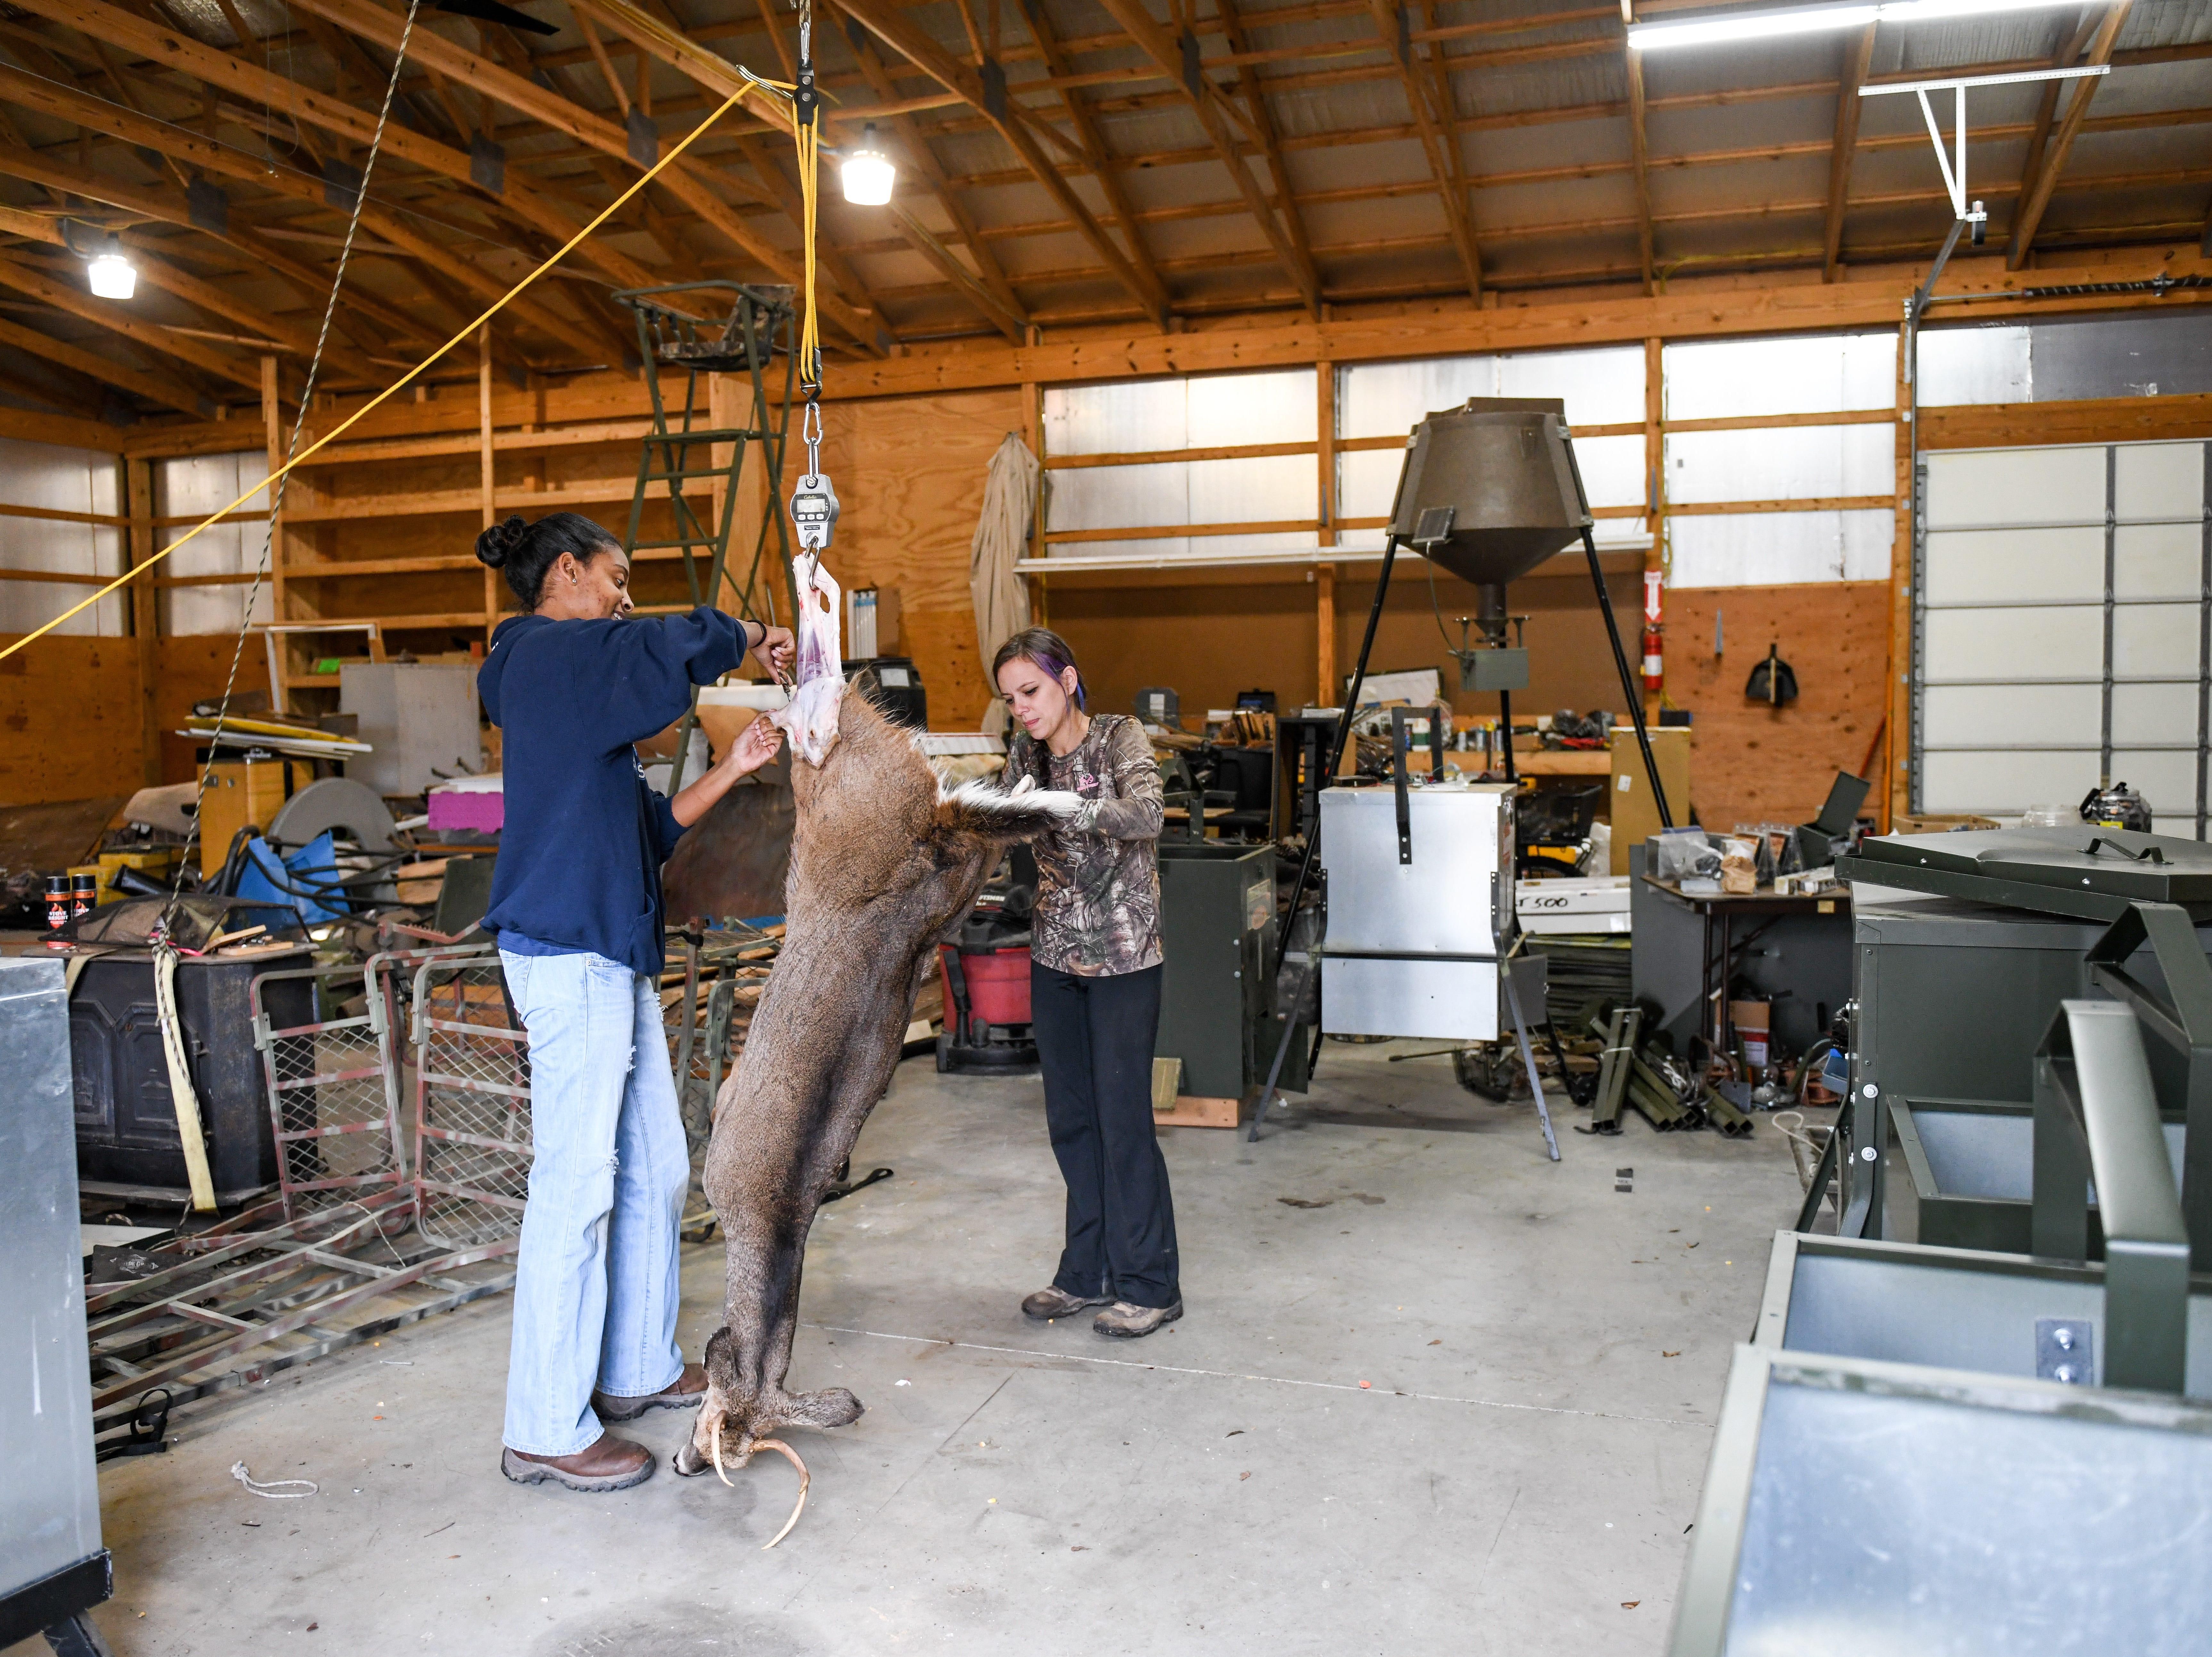 Maribeth Kulynycz and Nettiel Stewart work together to butcher a deer in Mardela Springs on Tuesday, Nov 6, 2018.